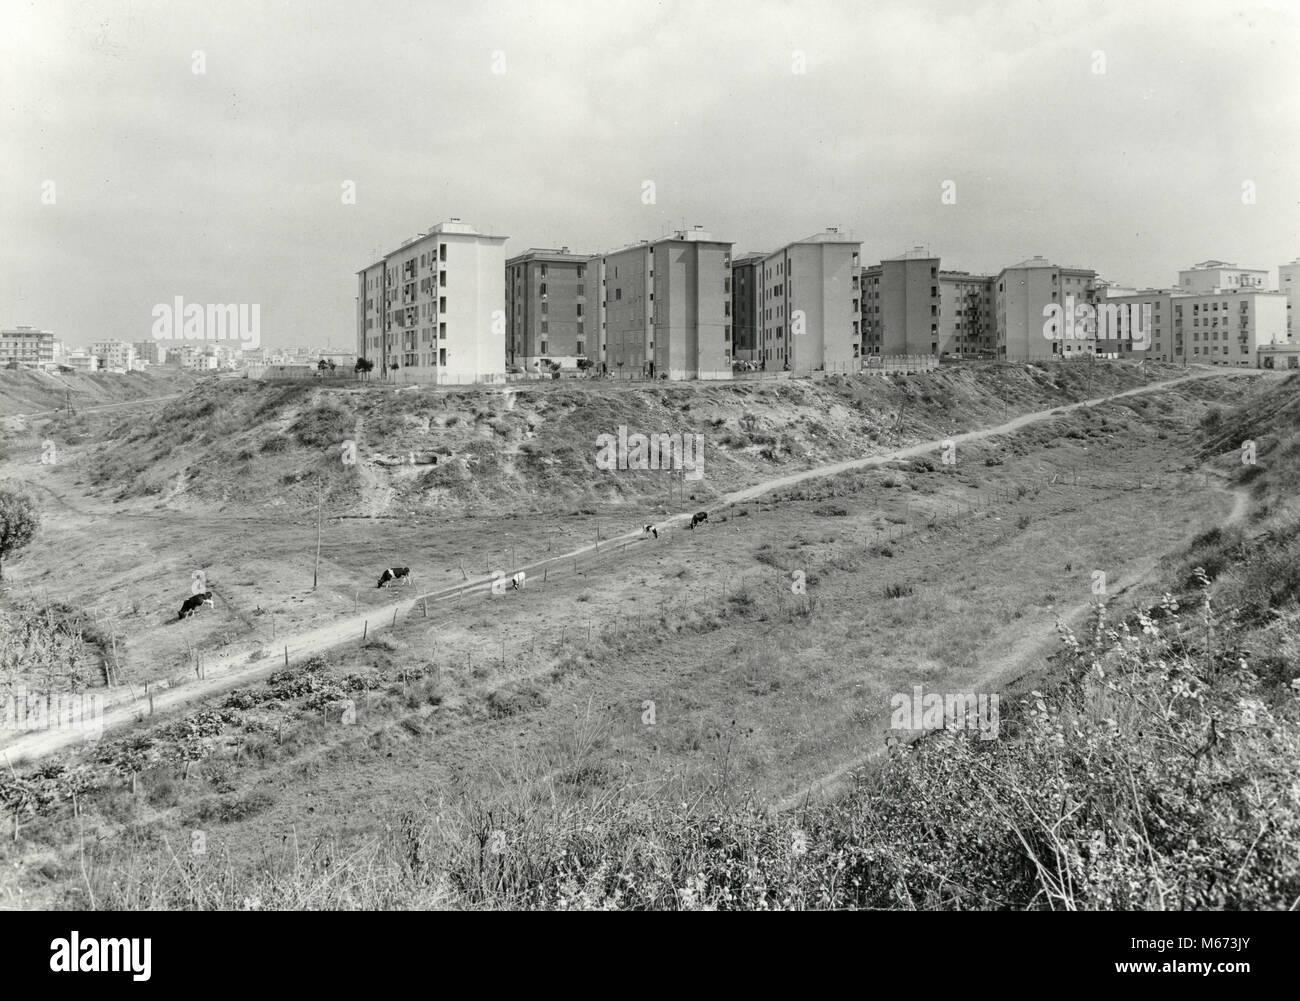 Primavalle Projekt Gebäude gerade abgeschlossen, Rom, Italien 1950 Stockbild